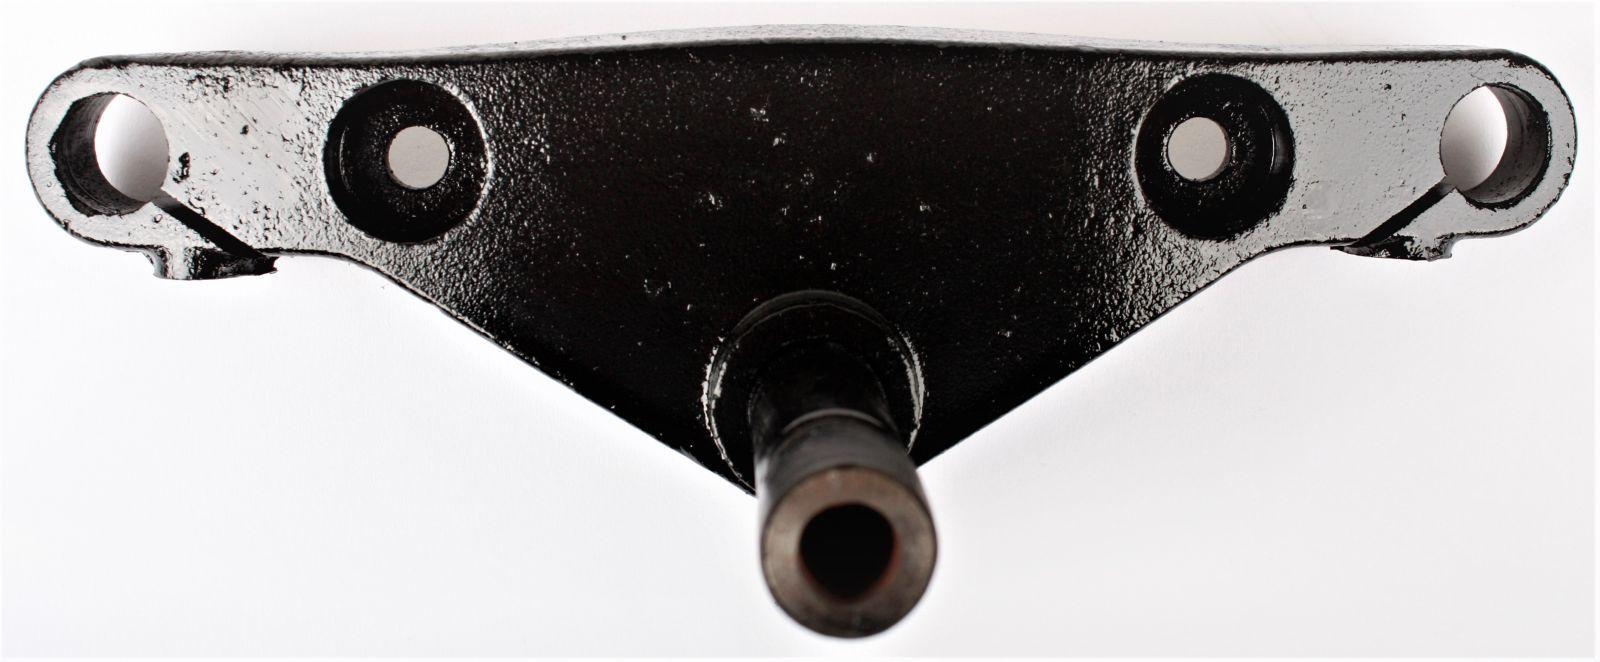 elektrokolobezka-trojúhelníkové-brýle-s-osou